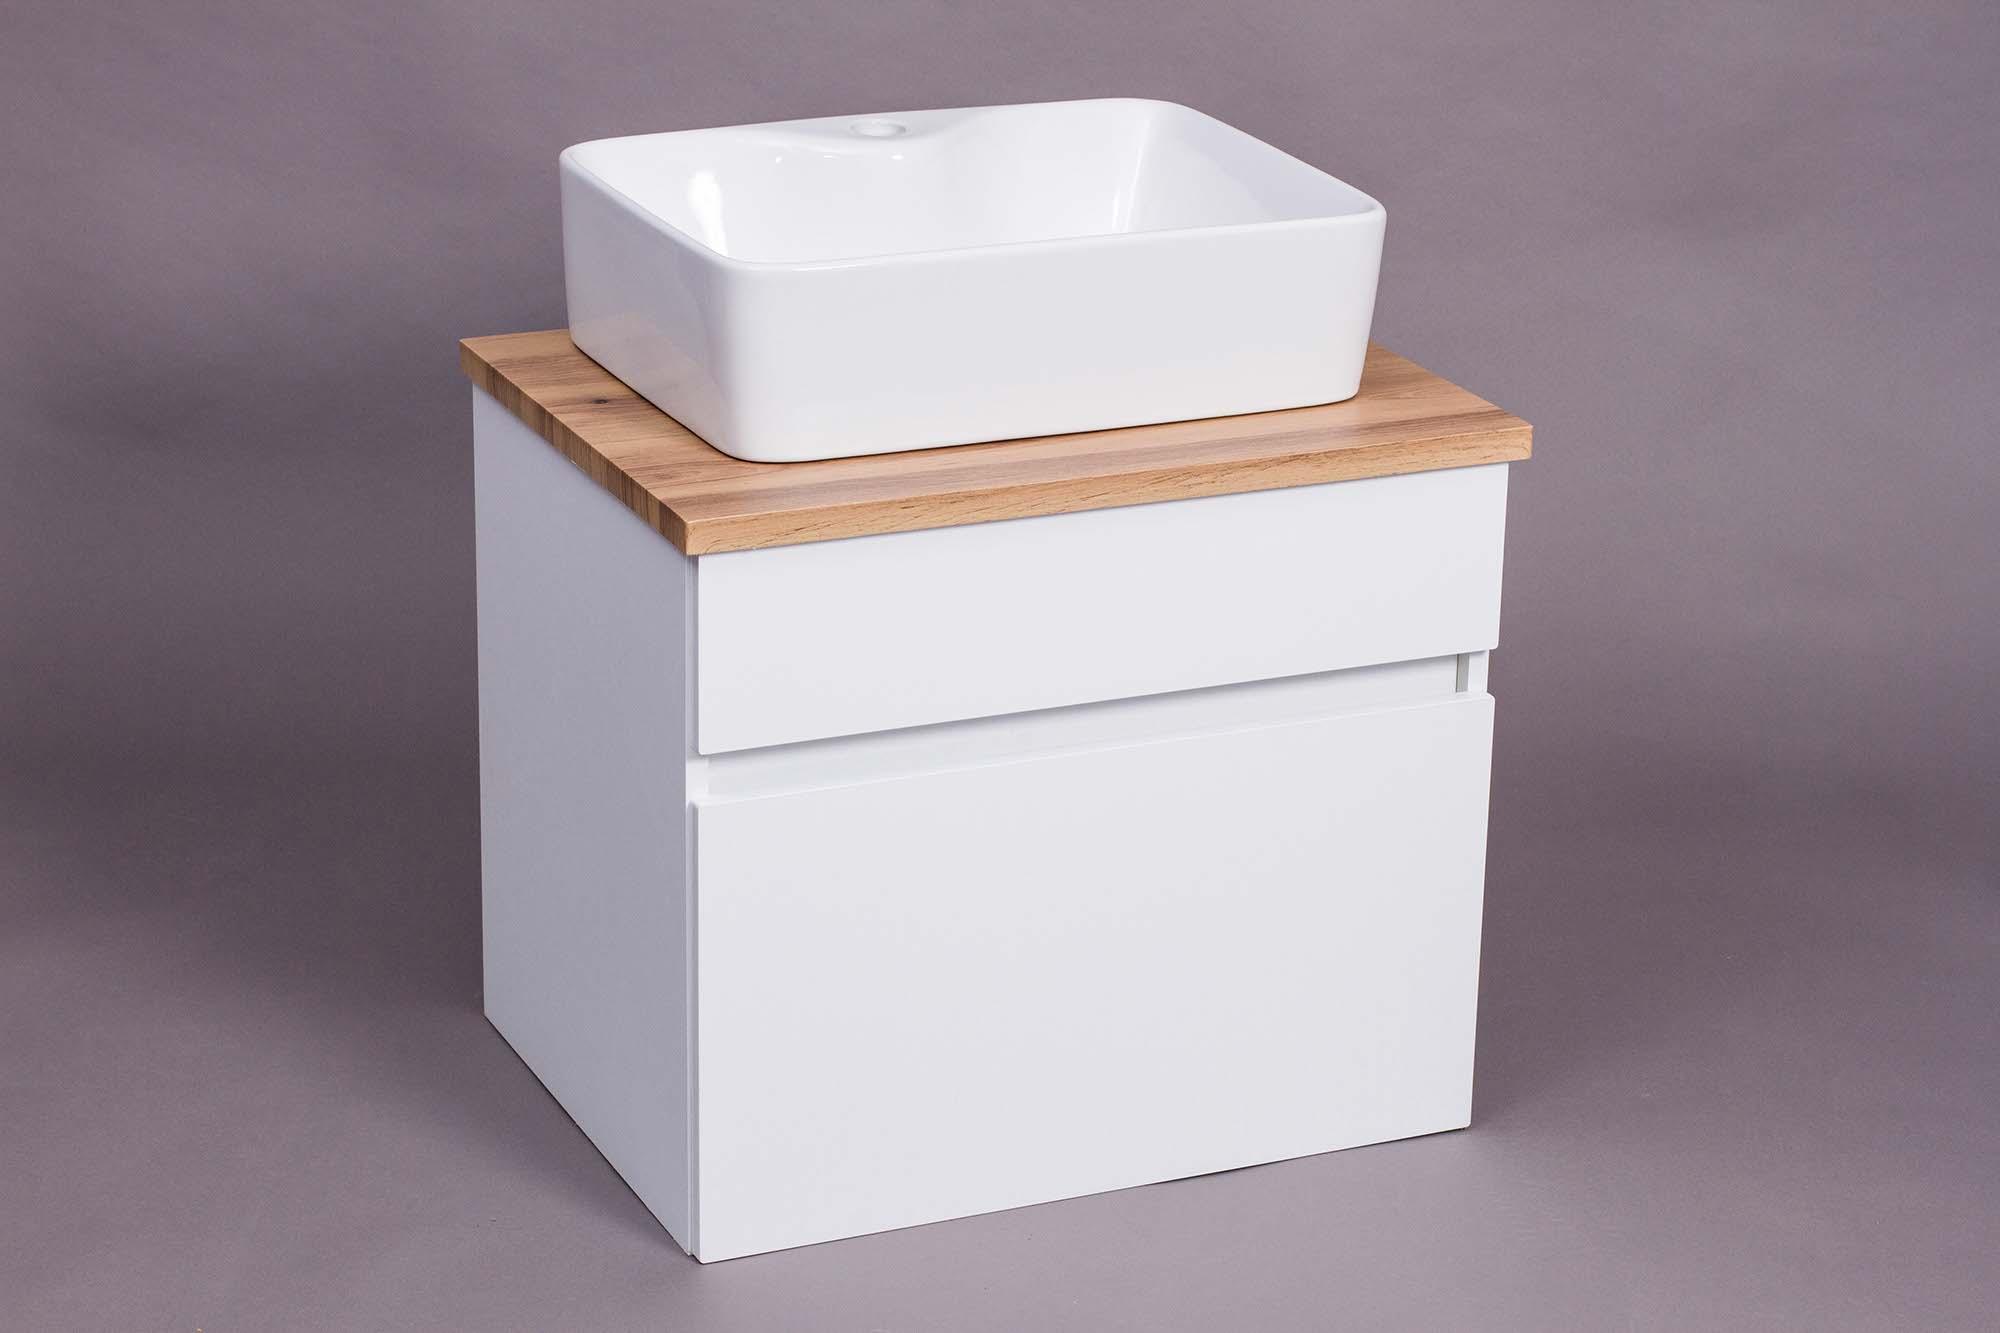 Canada 600* Cabinet & PVC Wrap Top